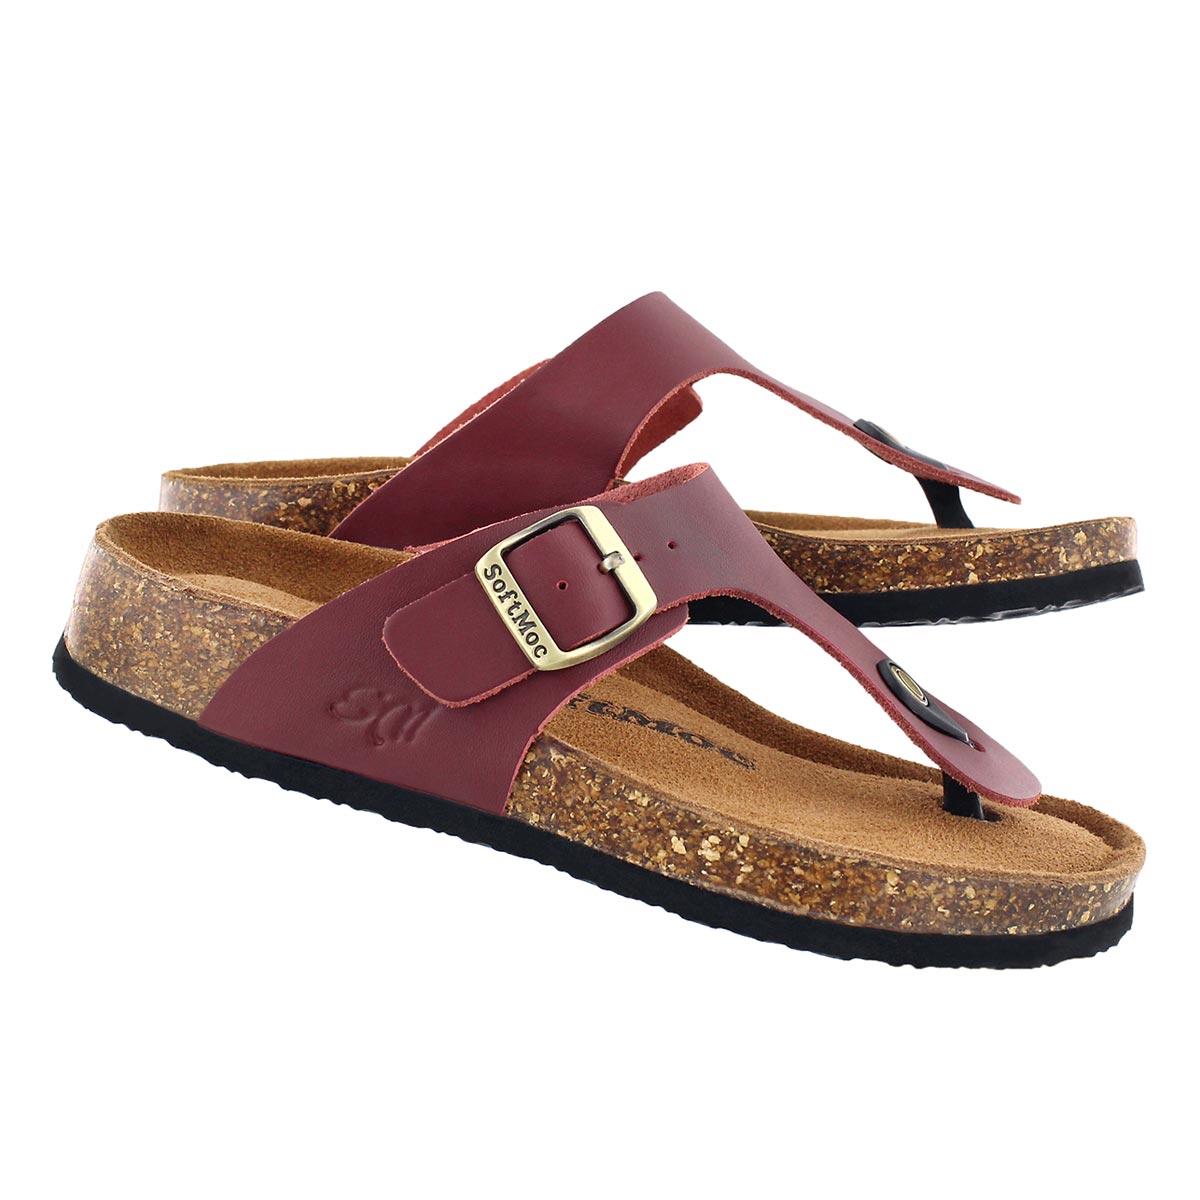 Lds Angy 5 burg memory foam thong sandal